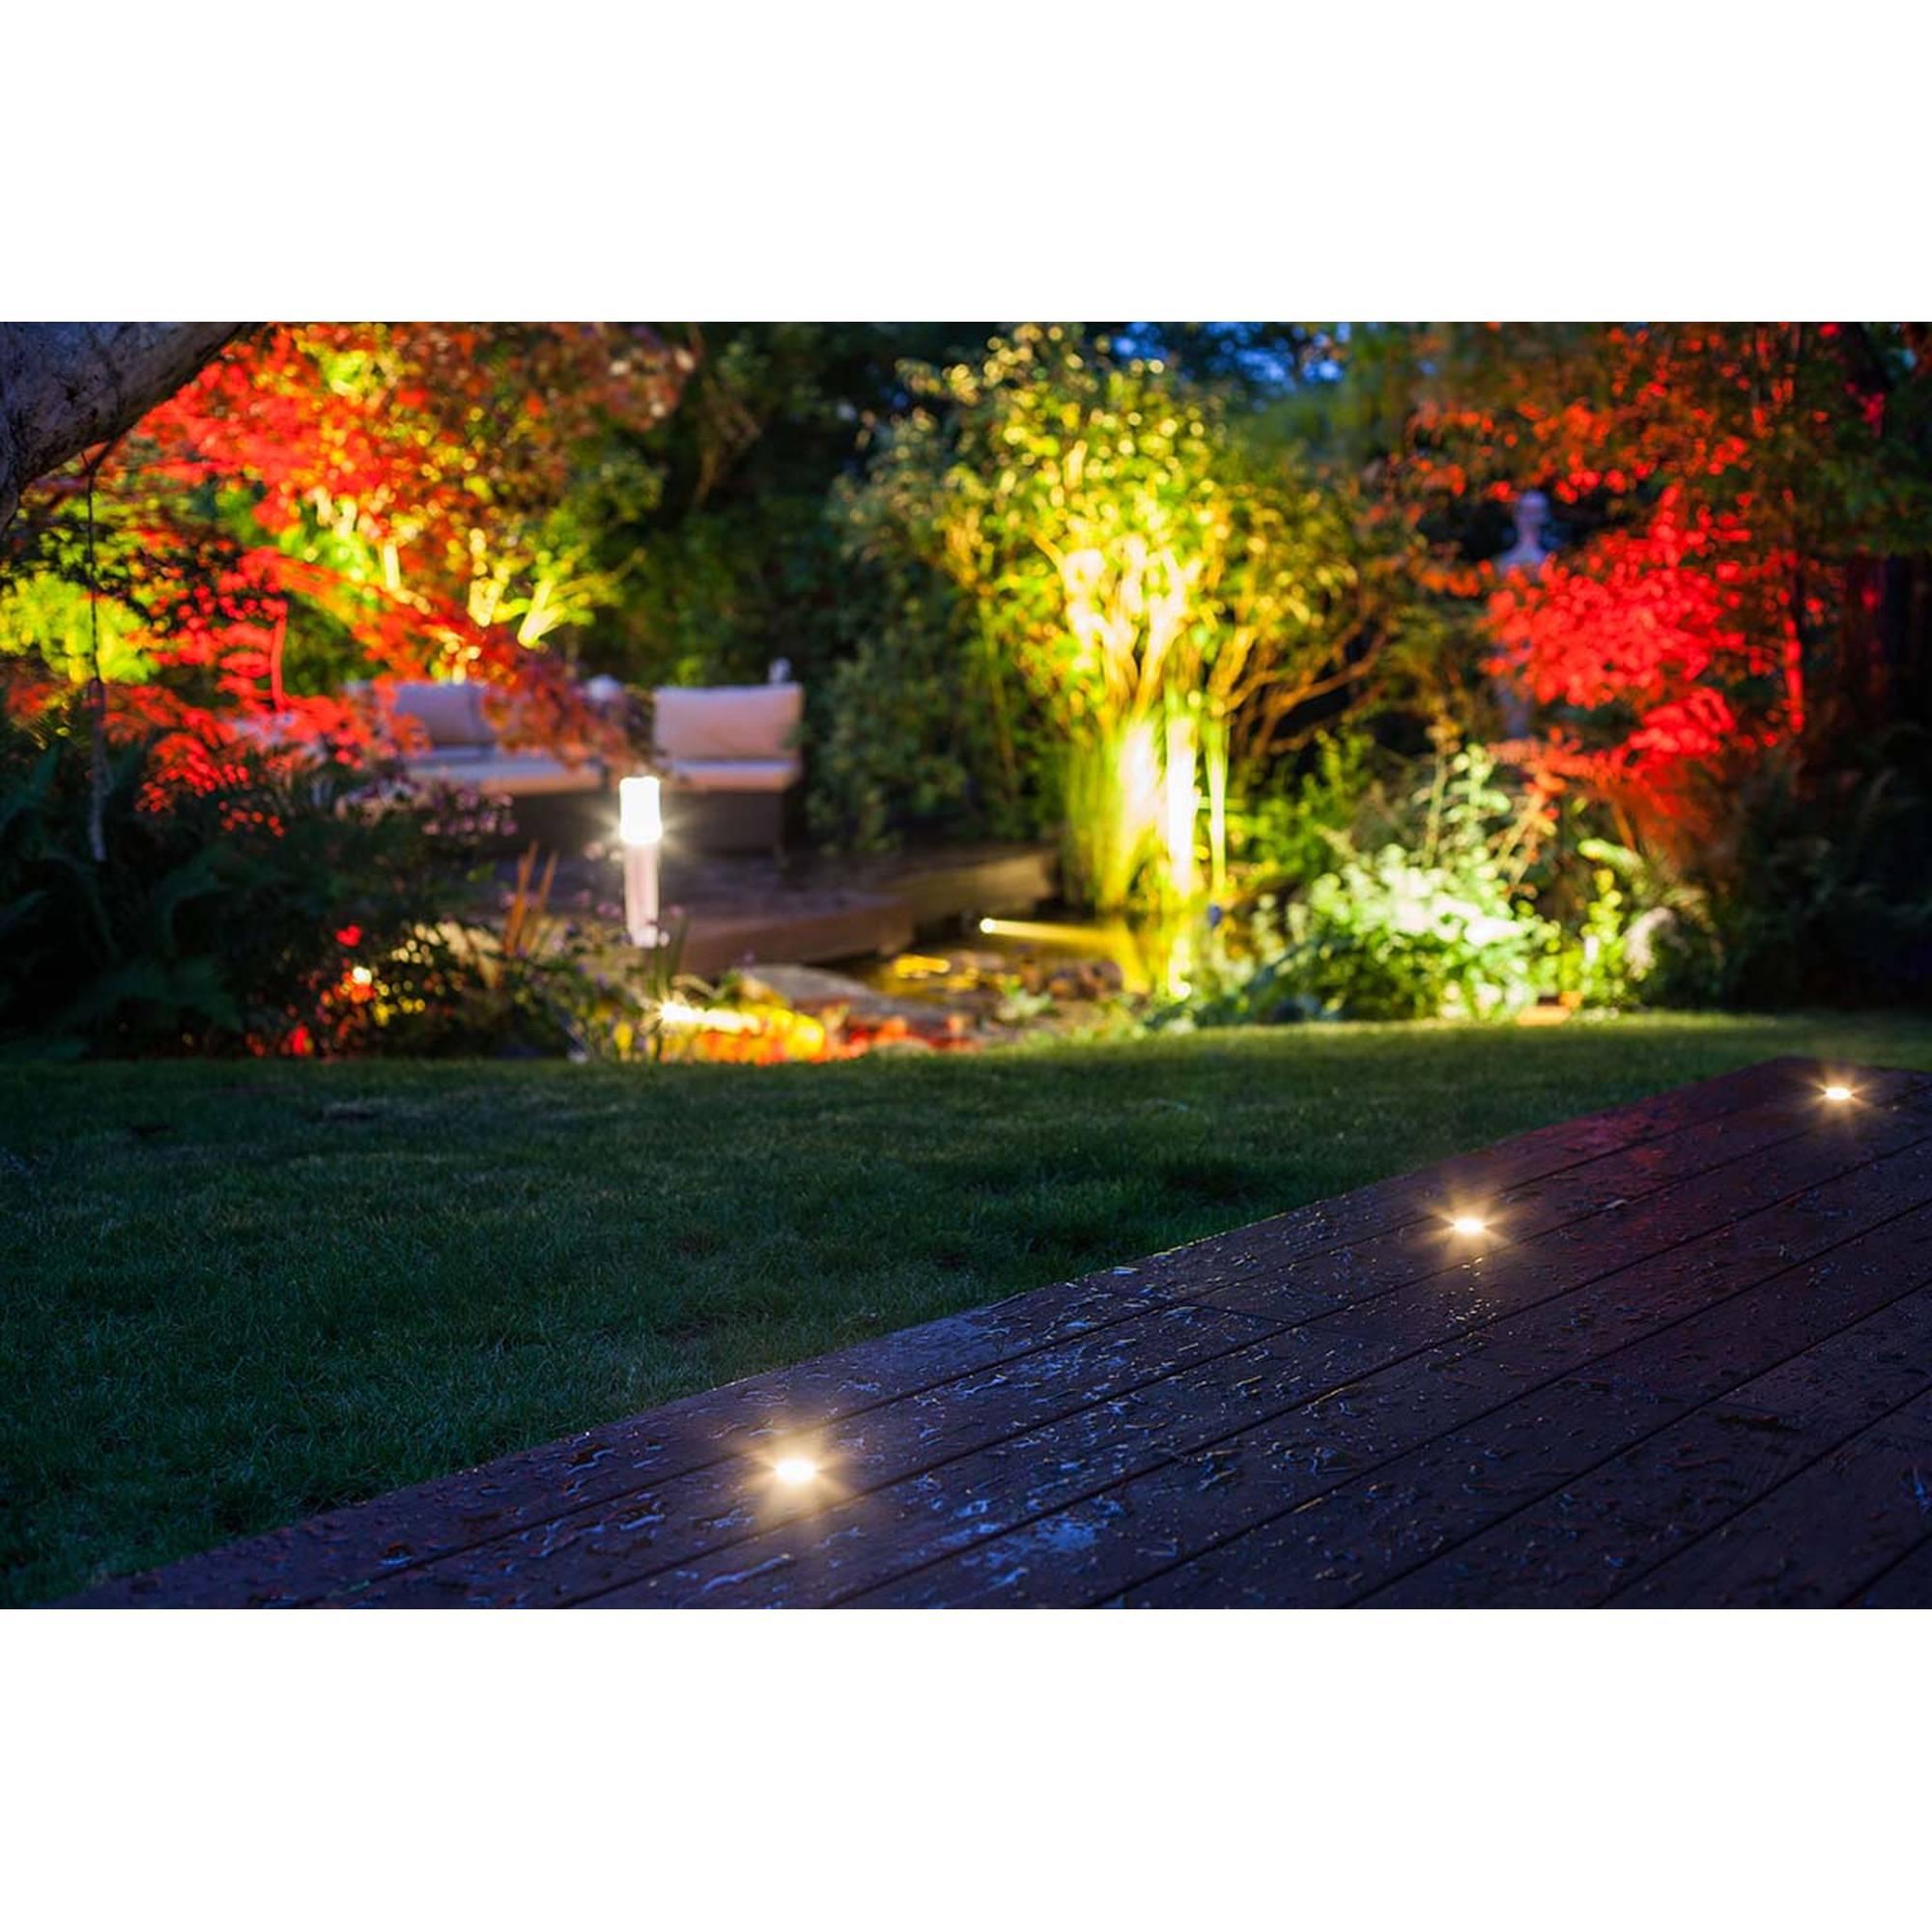 Heissner L451-00 Smart Light Bodeneinbau Spot und Decklight 1 Watt